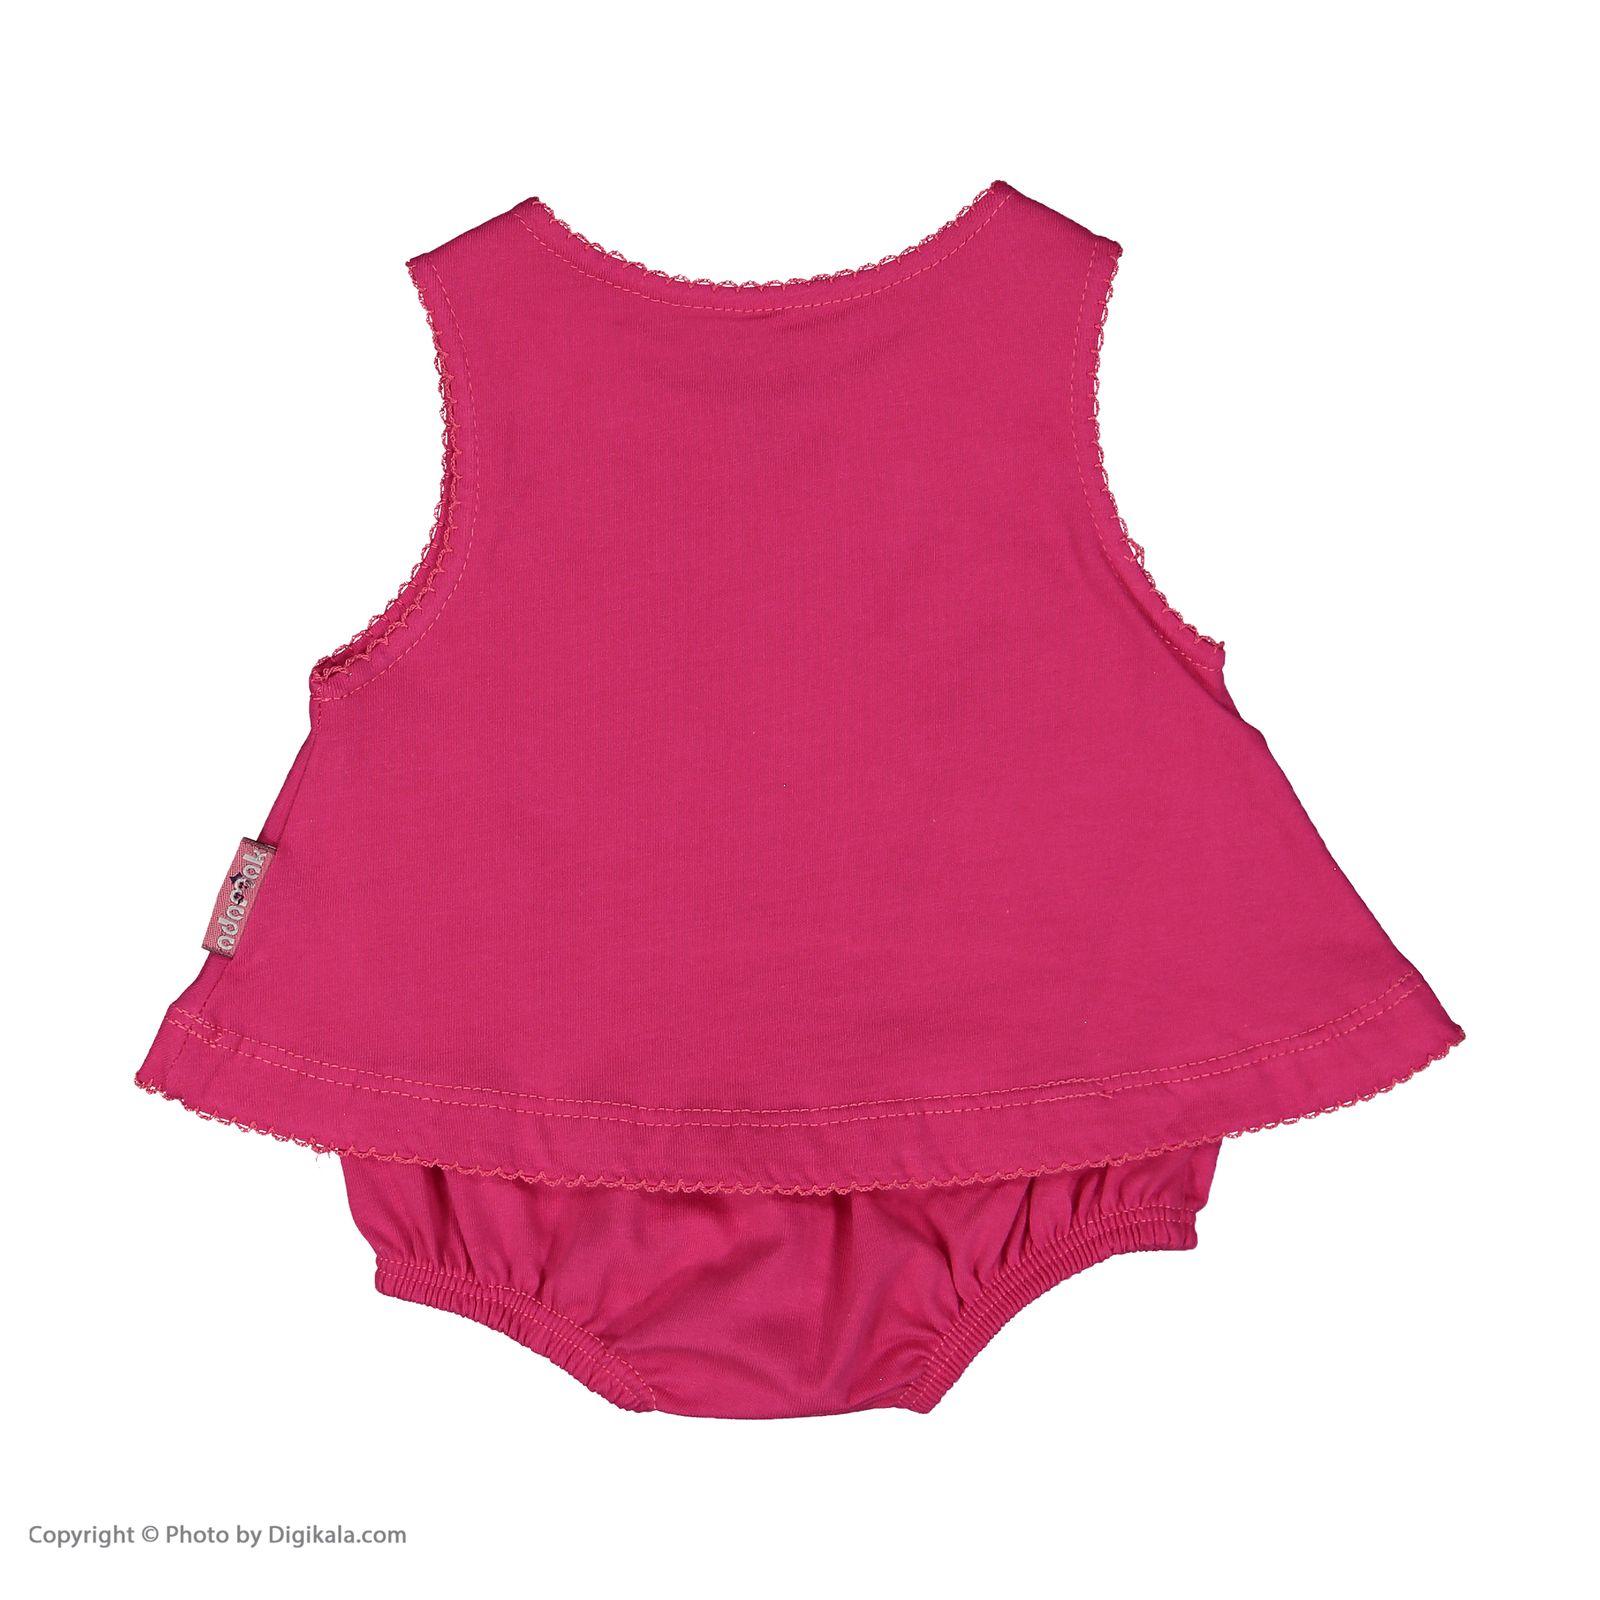 سرهمی نوزادی دخترانه آدمک مدل 2171108-88 -  - 5